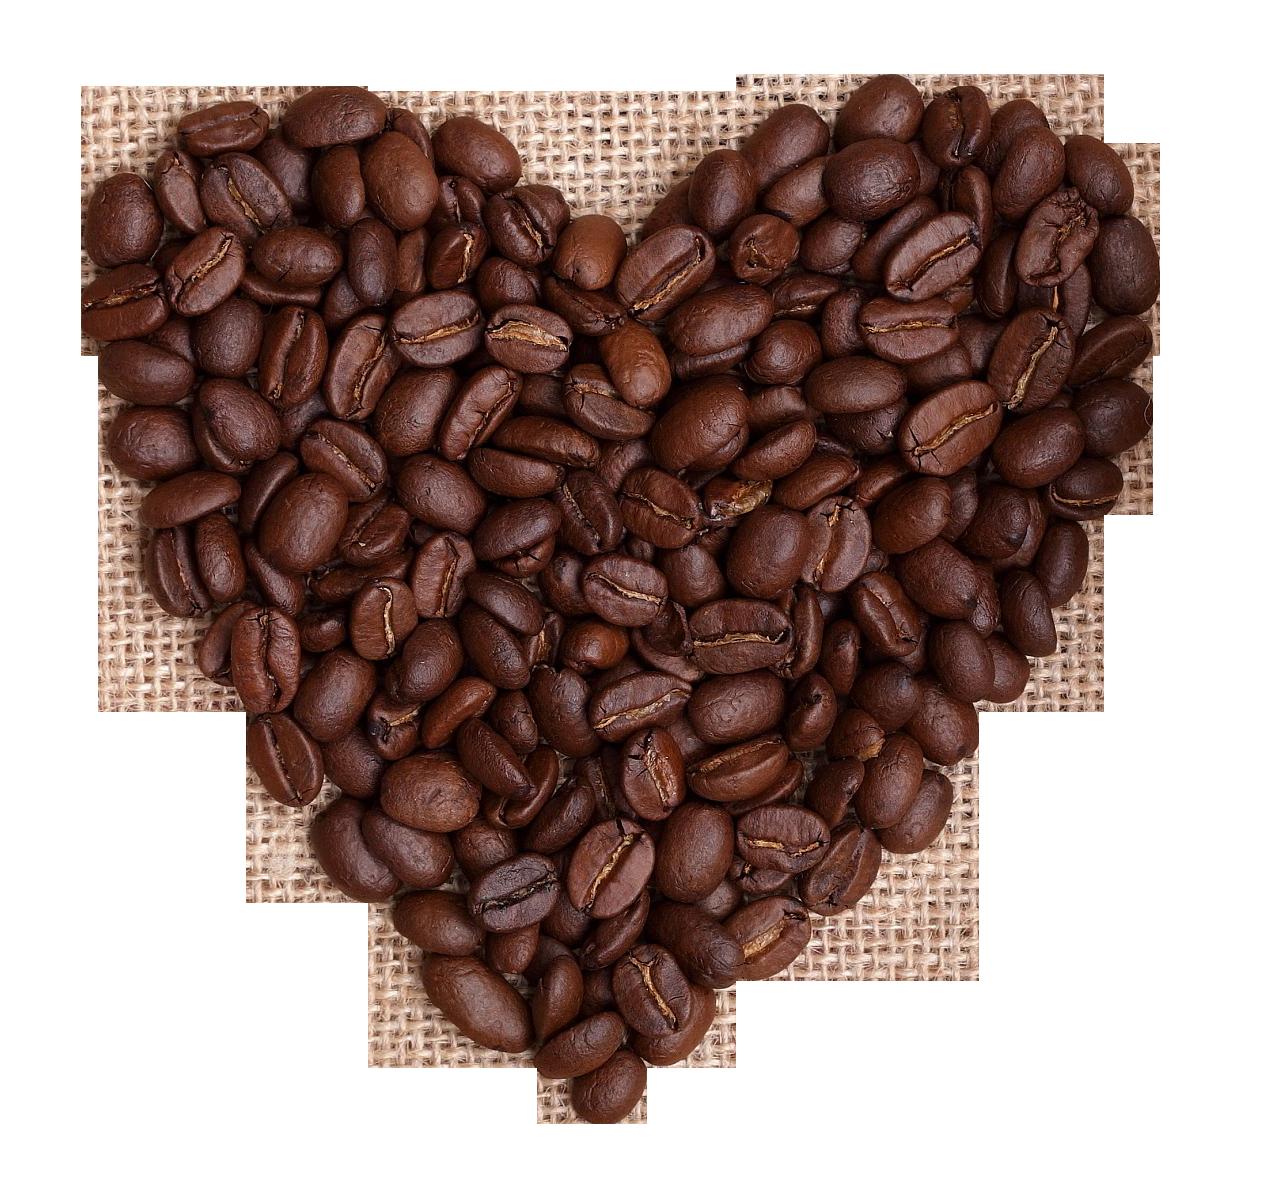 Coffee Beans Coffee Beans Coffee Bean Art Beans